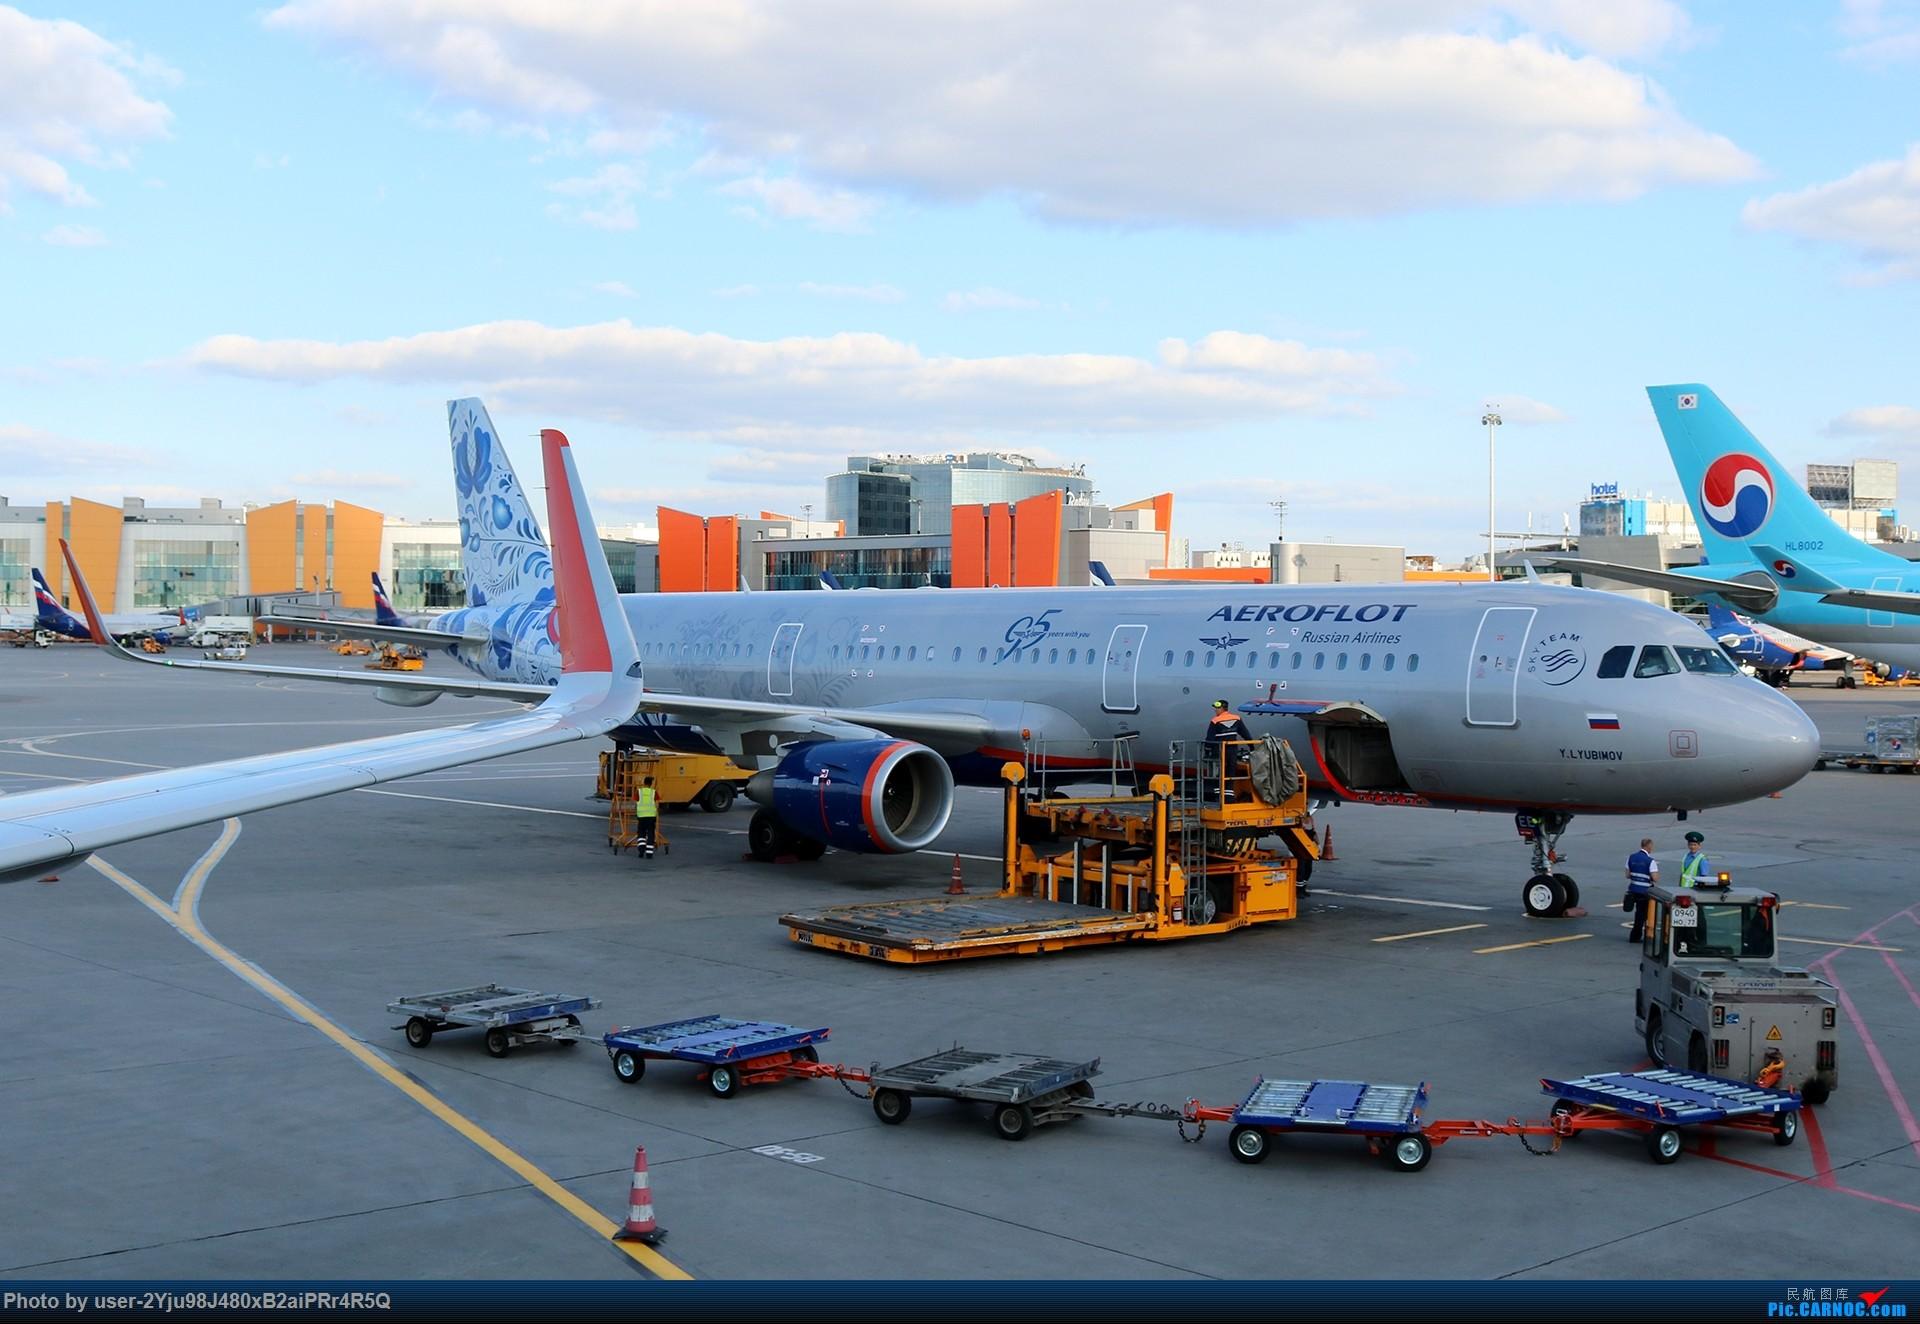 Re:[原创]LIULIU Sheremetyevo的漫游 Aeroflot毛航篇 AIRBUS A321-211(SL) VP-BEE 俄罗斯谢诺梅杰沃机场